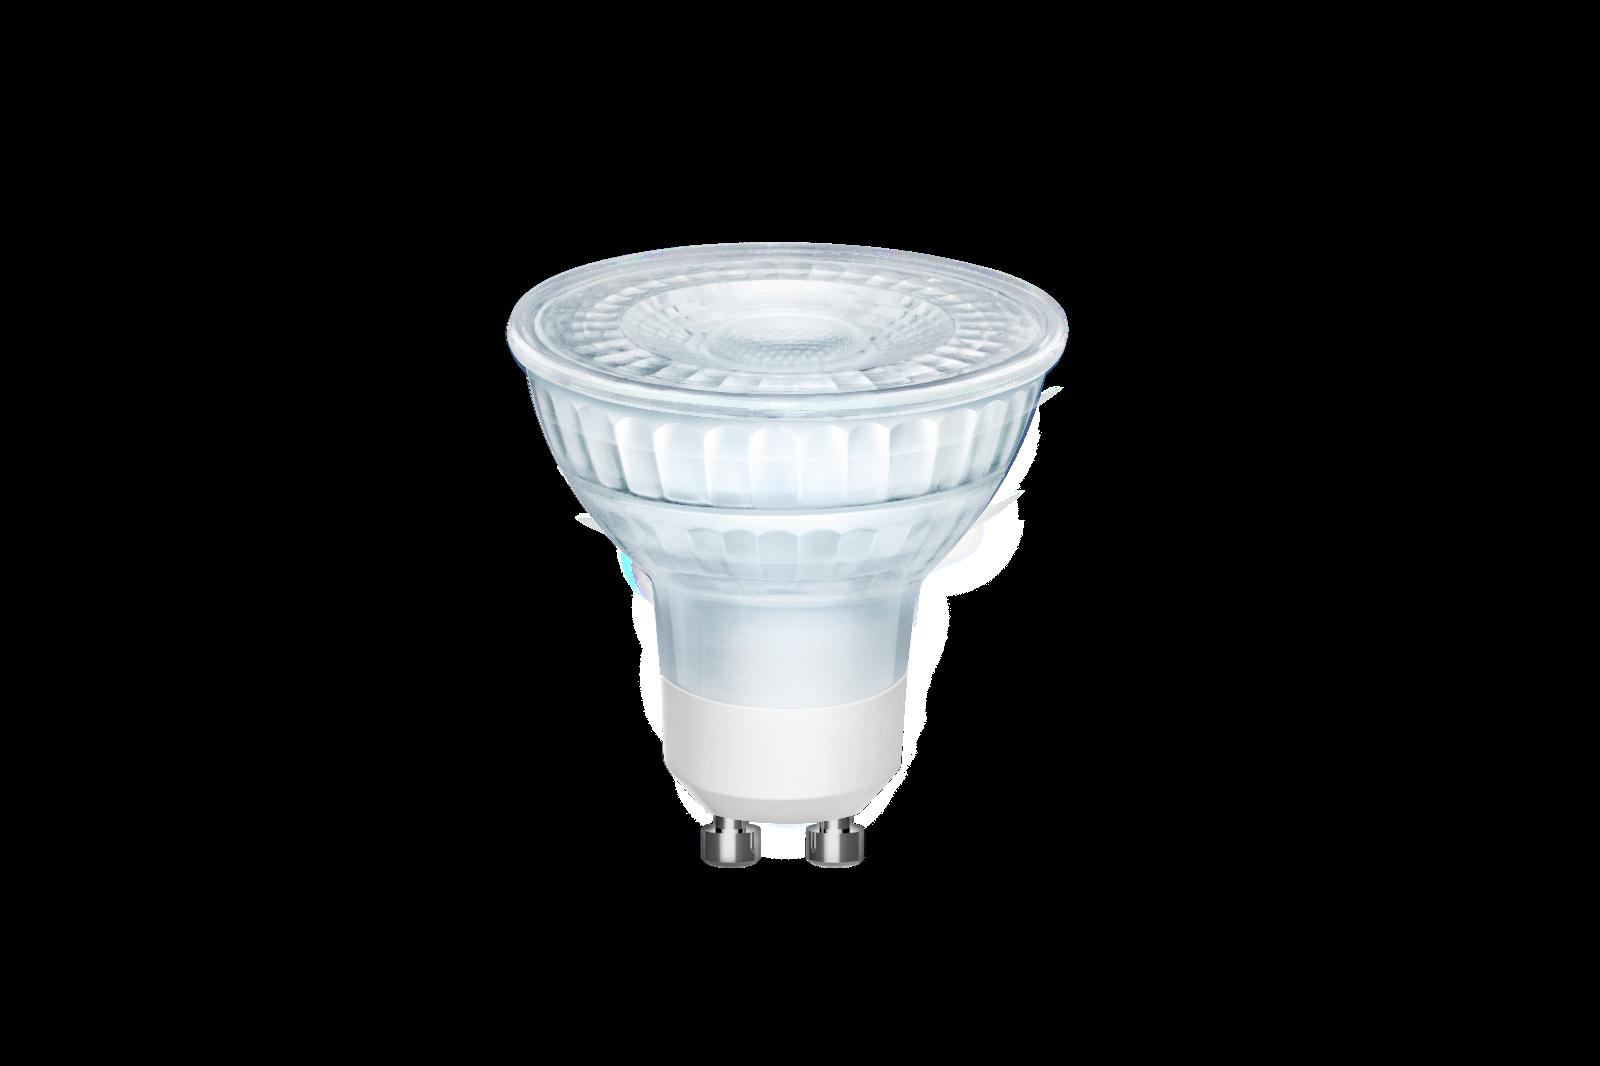 50w Halogen Replacement LED 5w GU10 Bulbs Warm Weiß,Cool Weiß or 5,10,20 or 50